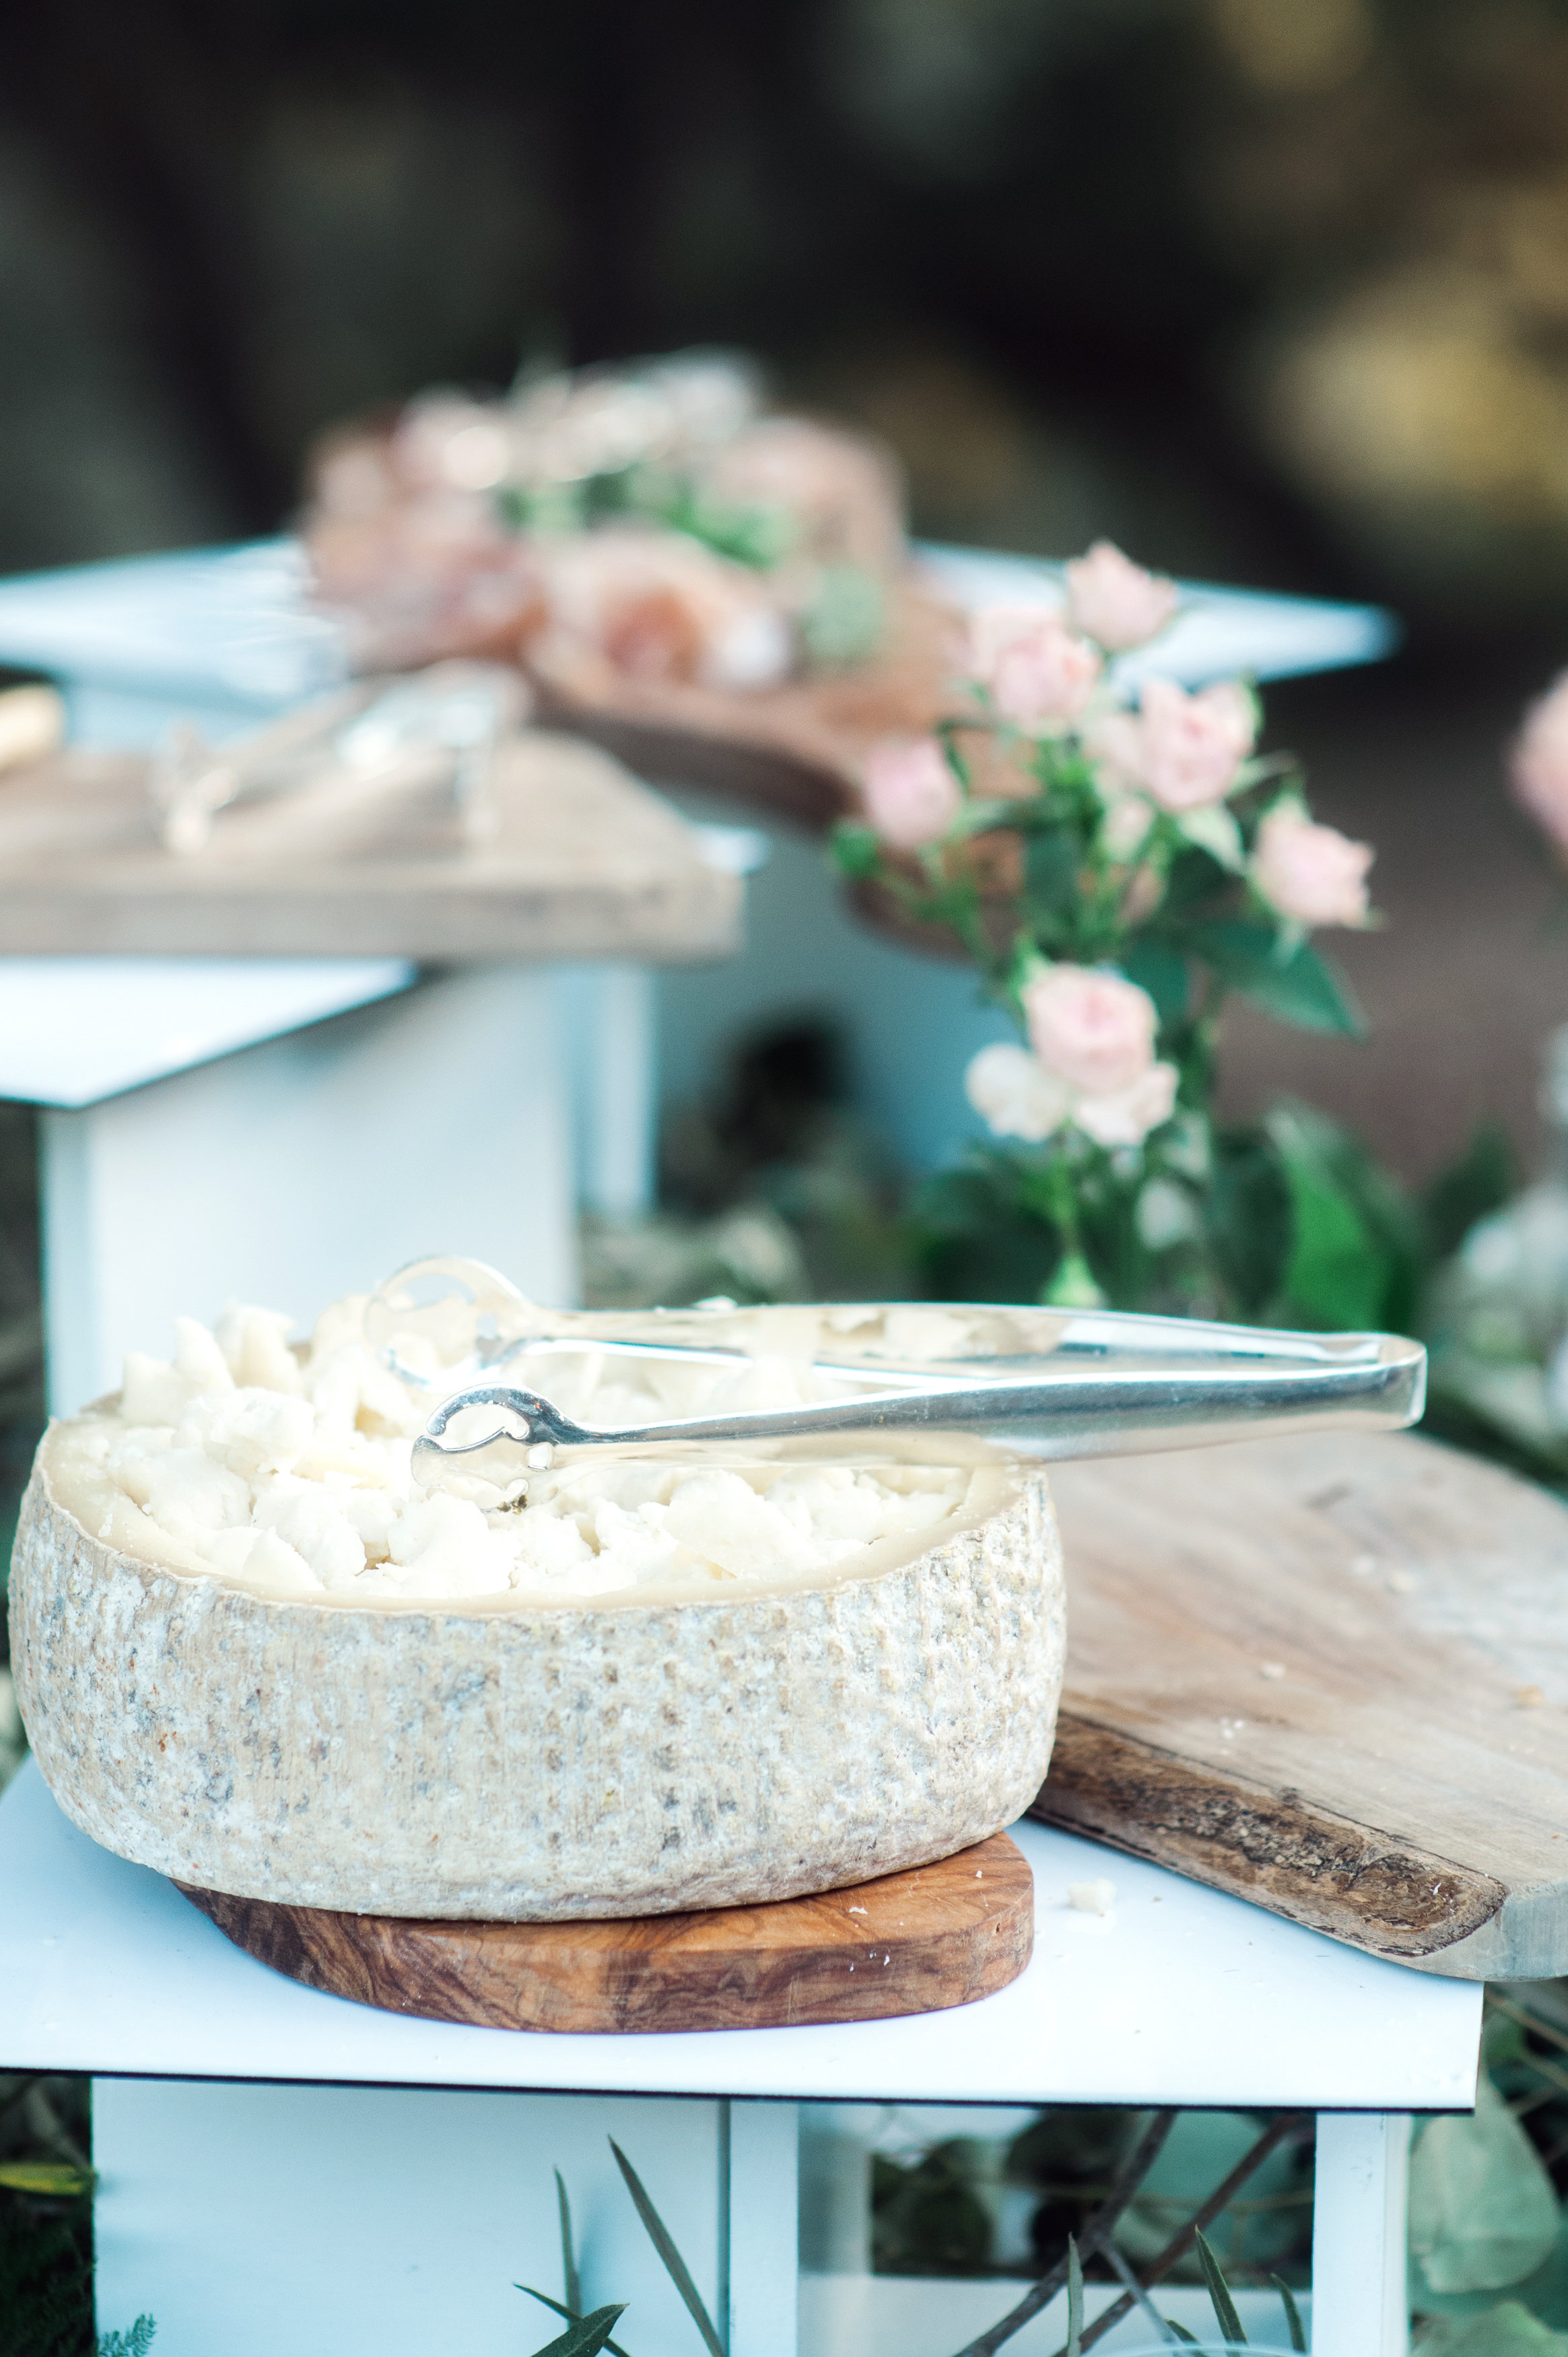 santabarbarawedding.com | Wisteria Lane Flroal Design Studio | Bride and Groom | Garden Roses | Tea Roses | Food Station Decor